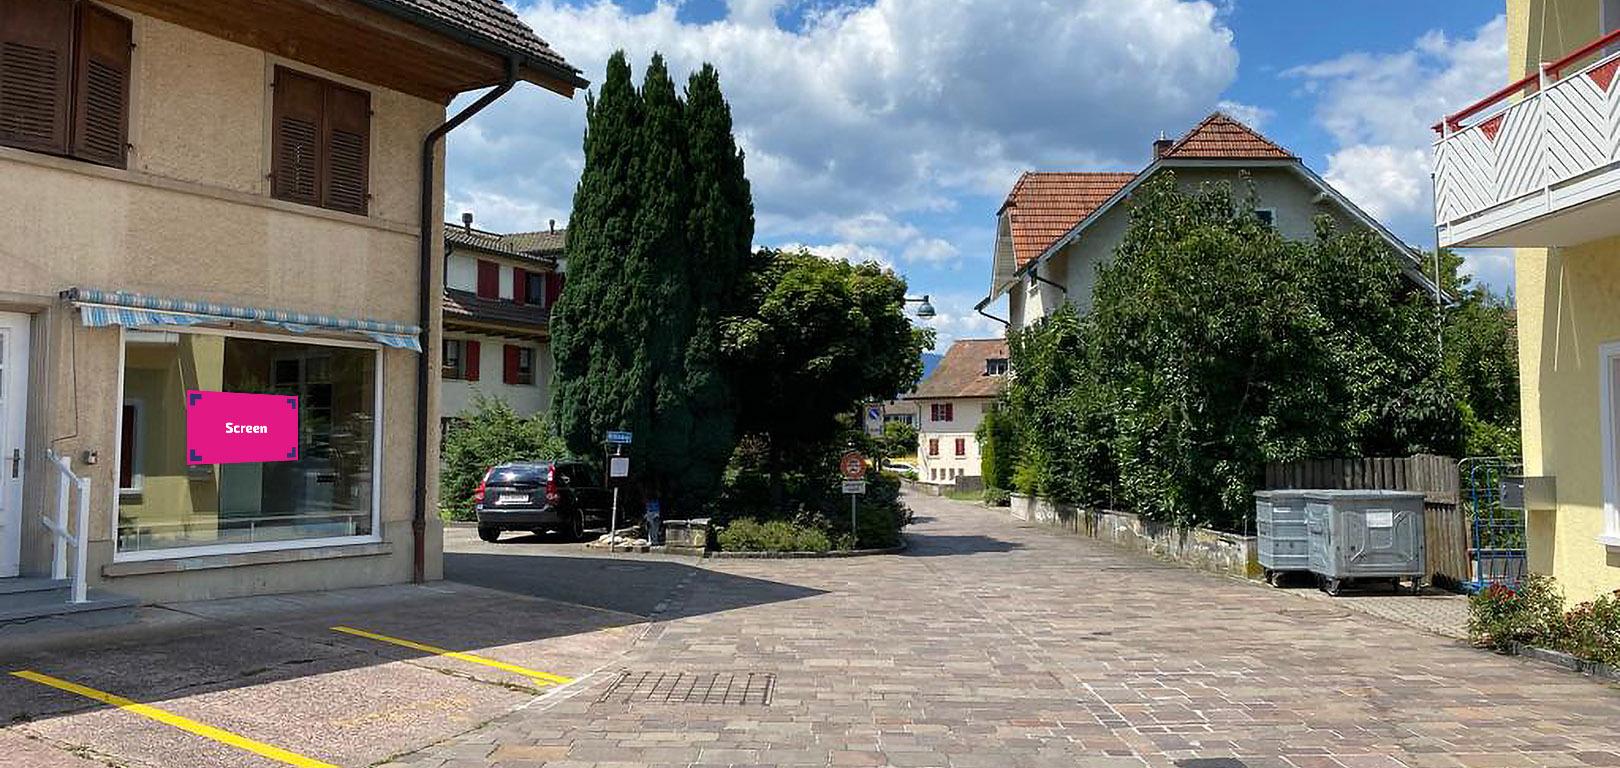 q_Solothurn_Gerlafingen